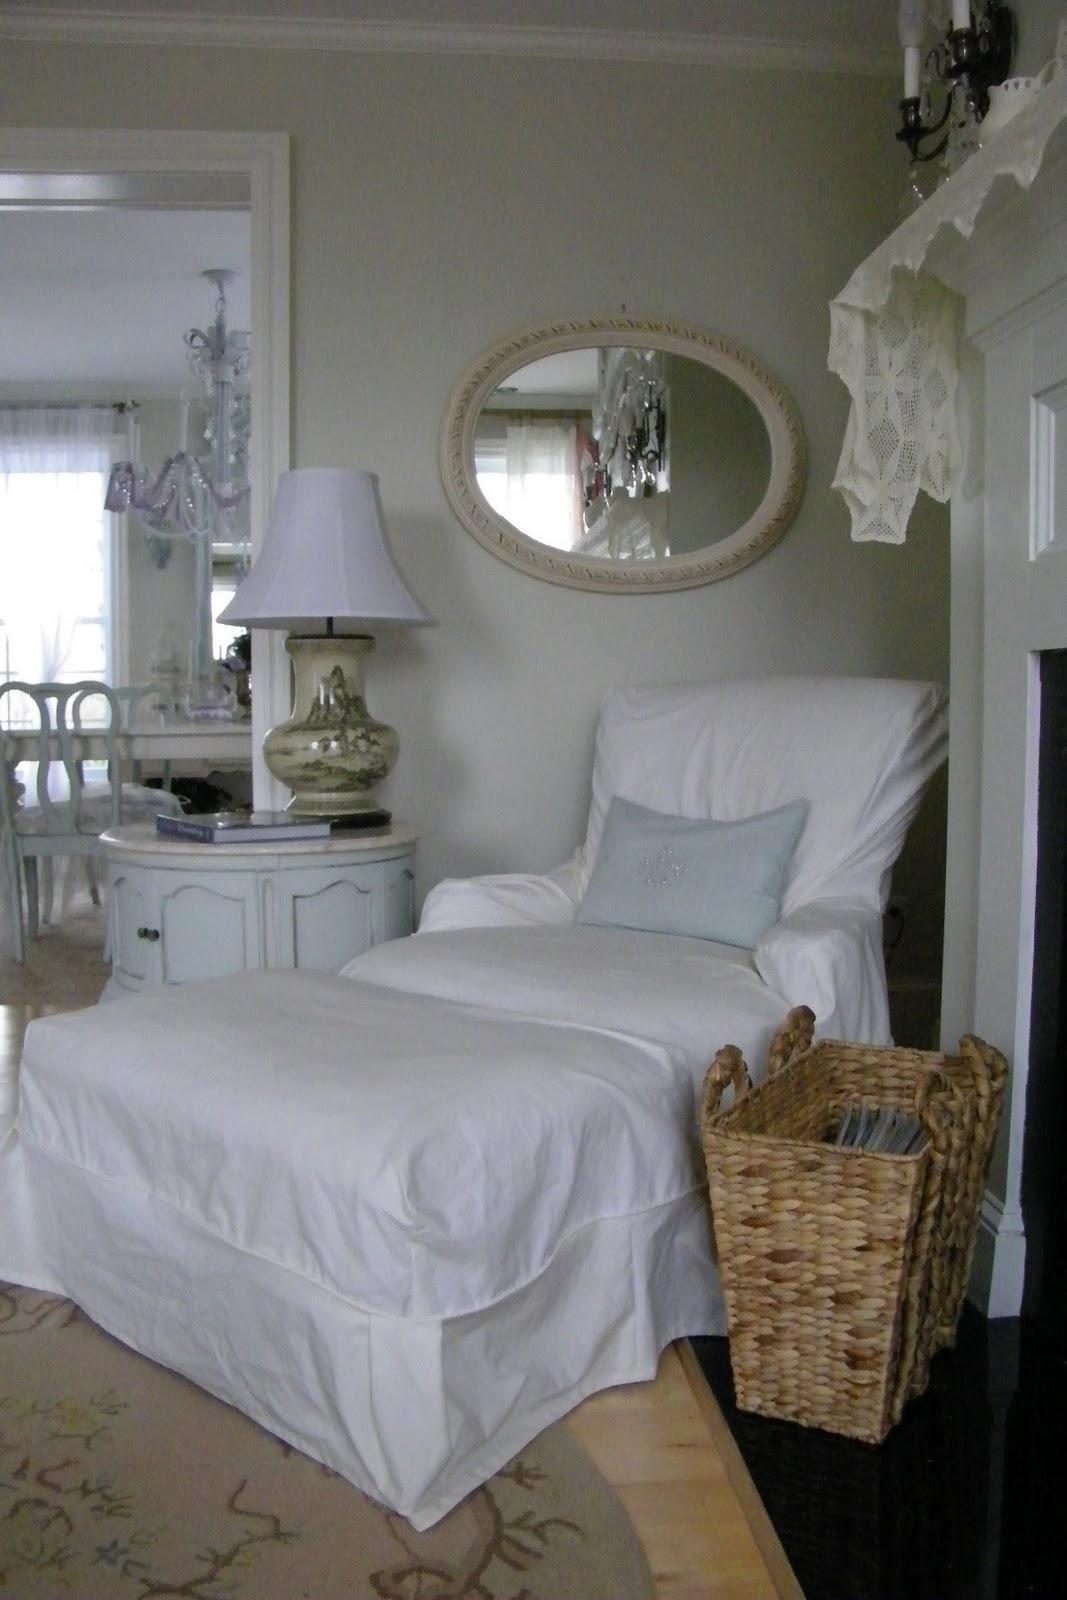 Maison Decor: Shabby Chic Slipcover Style